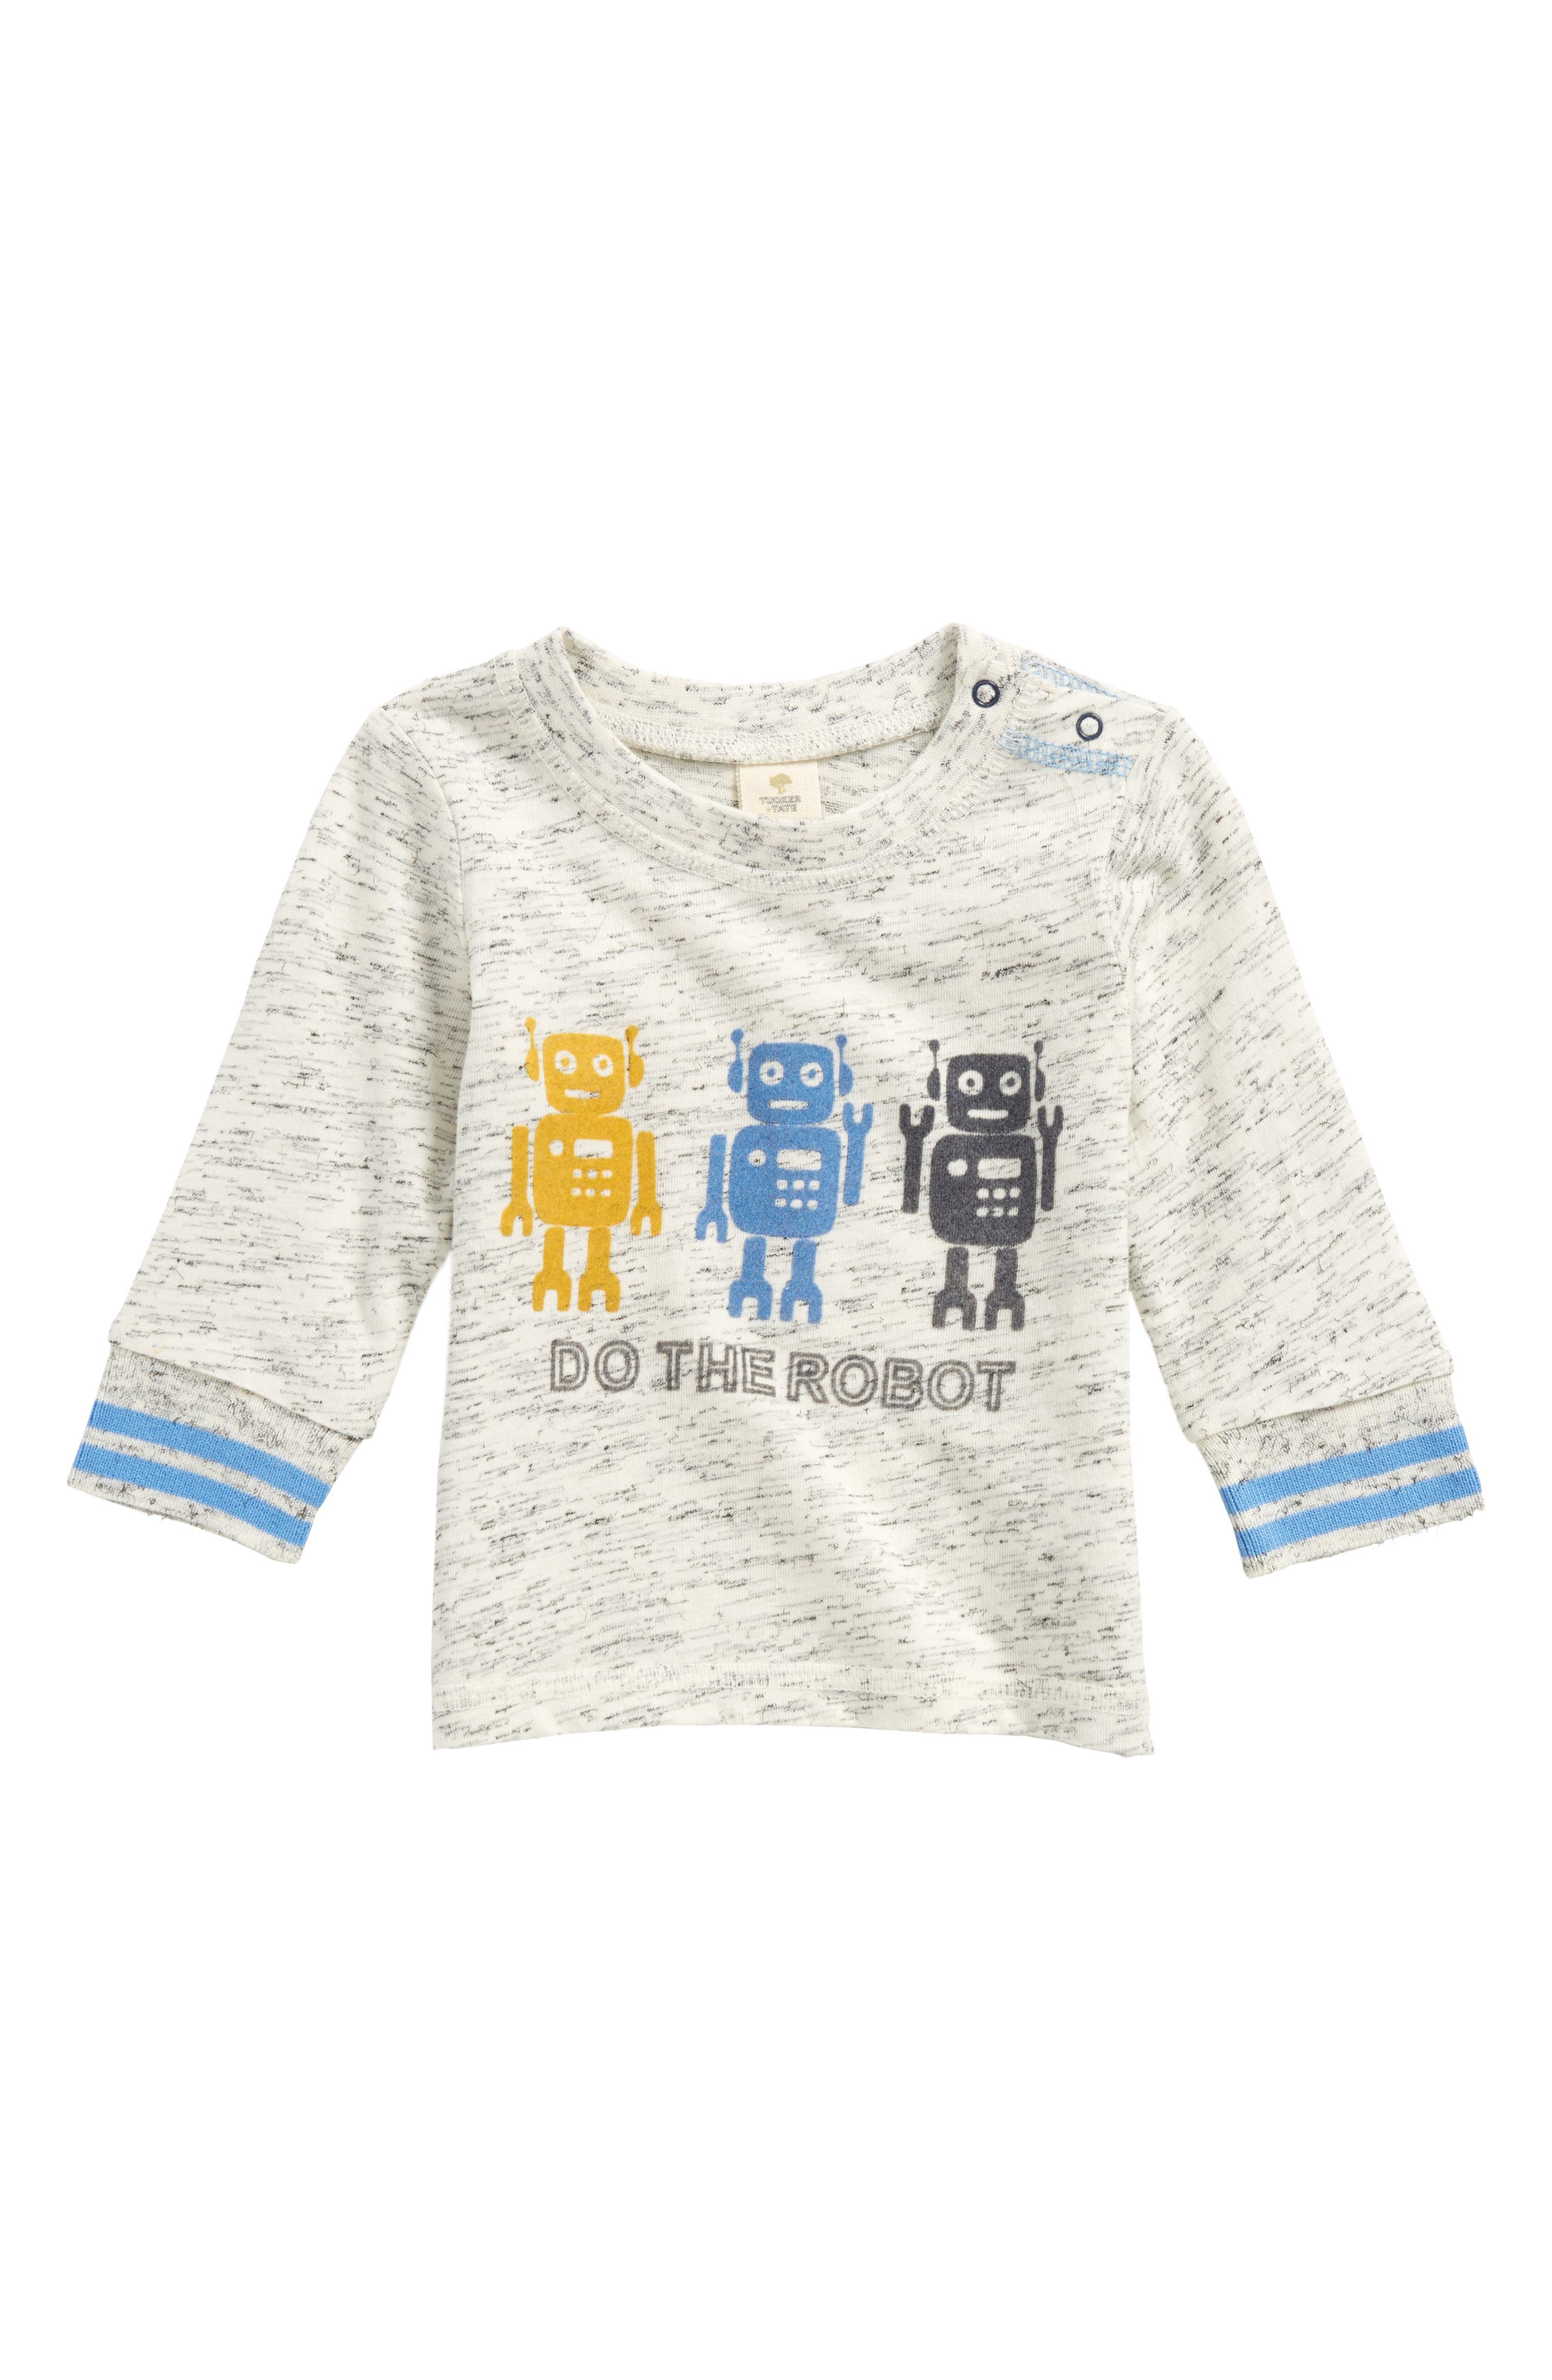 Main Image - Tucker + Tate Robot T-Shirt (Baby Boys)